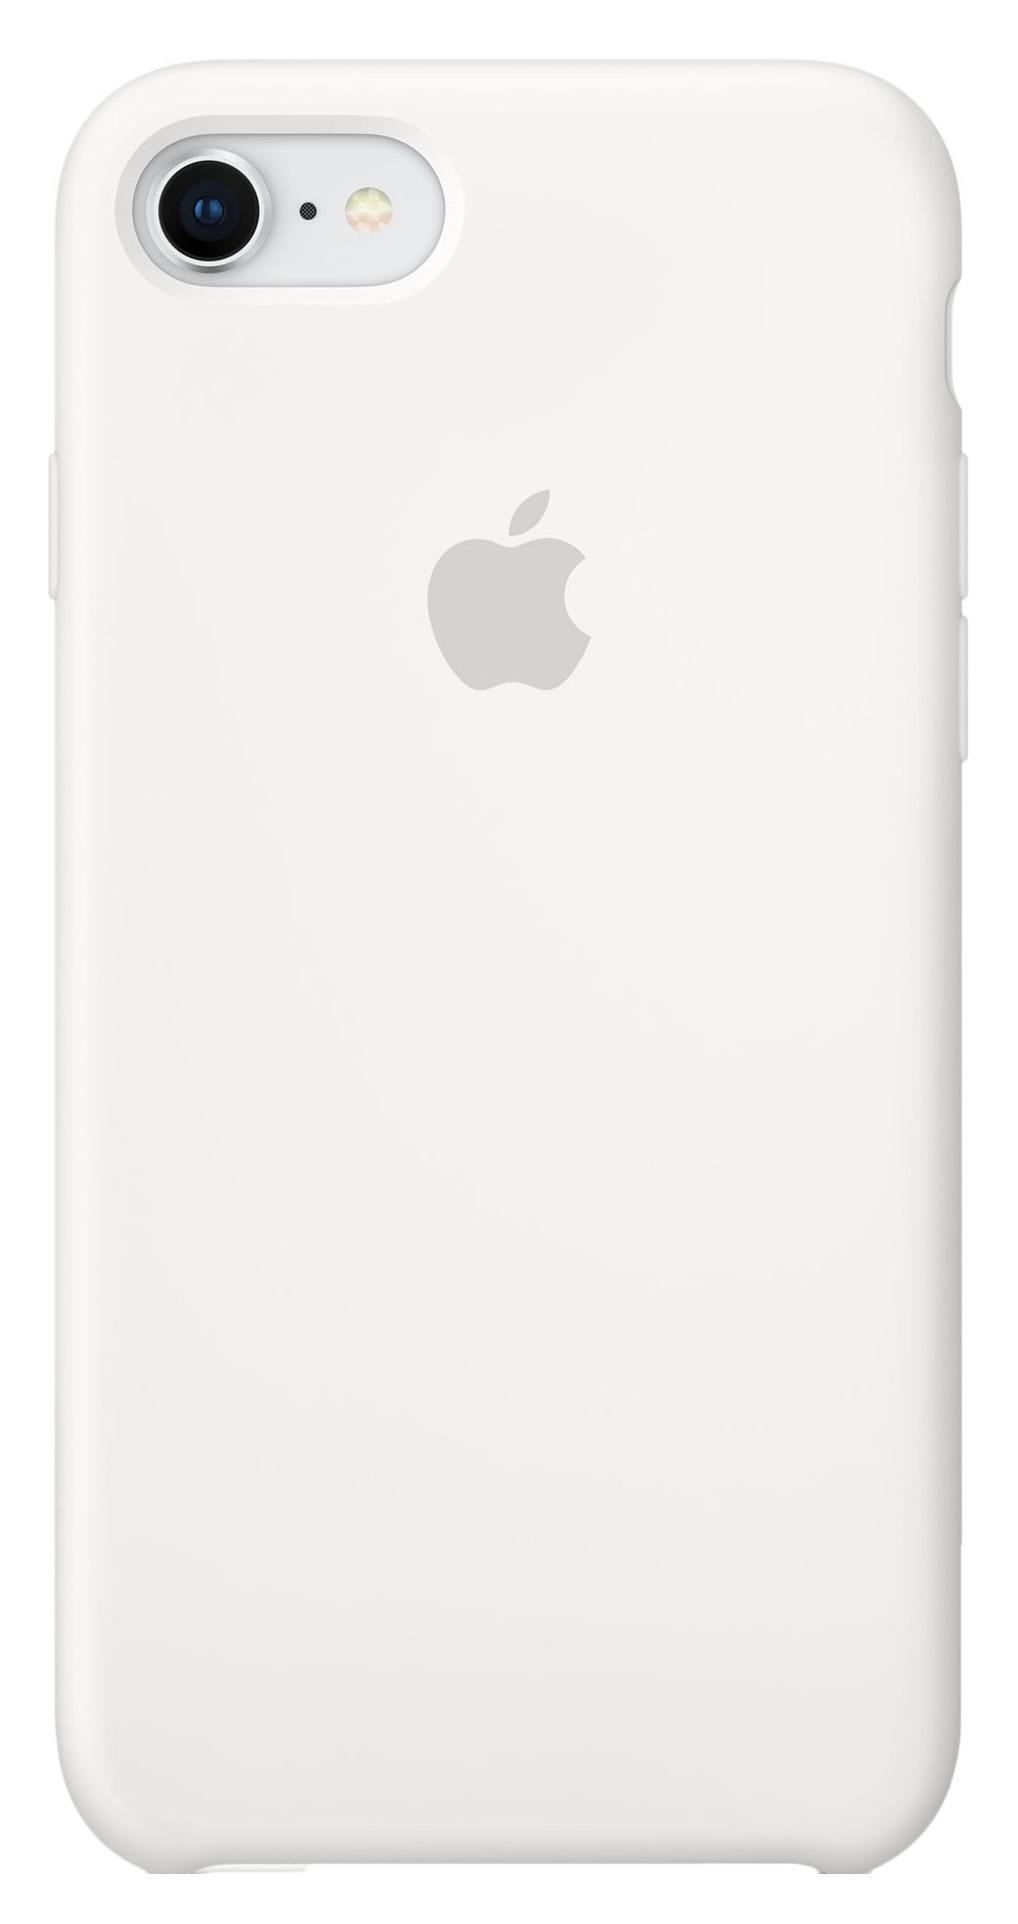 Кейс для Apple iPhone iPhone 8 / 7 Silicone Case White (MQGL2ZM/A)  - купить со скидкой